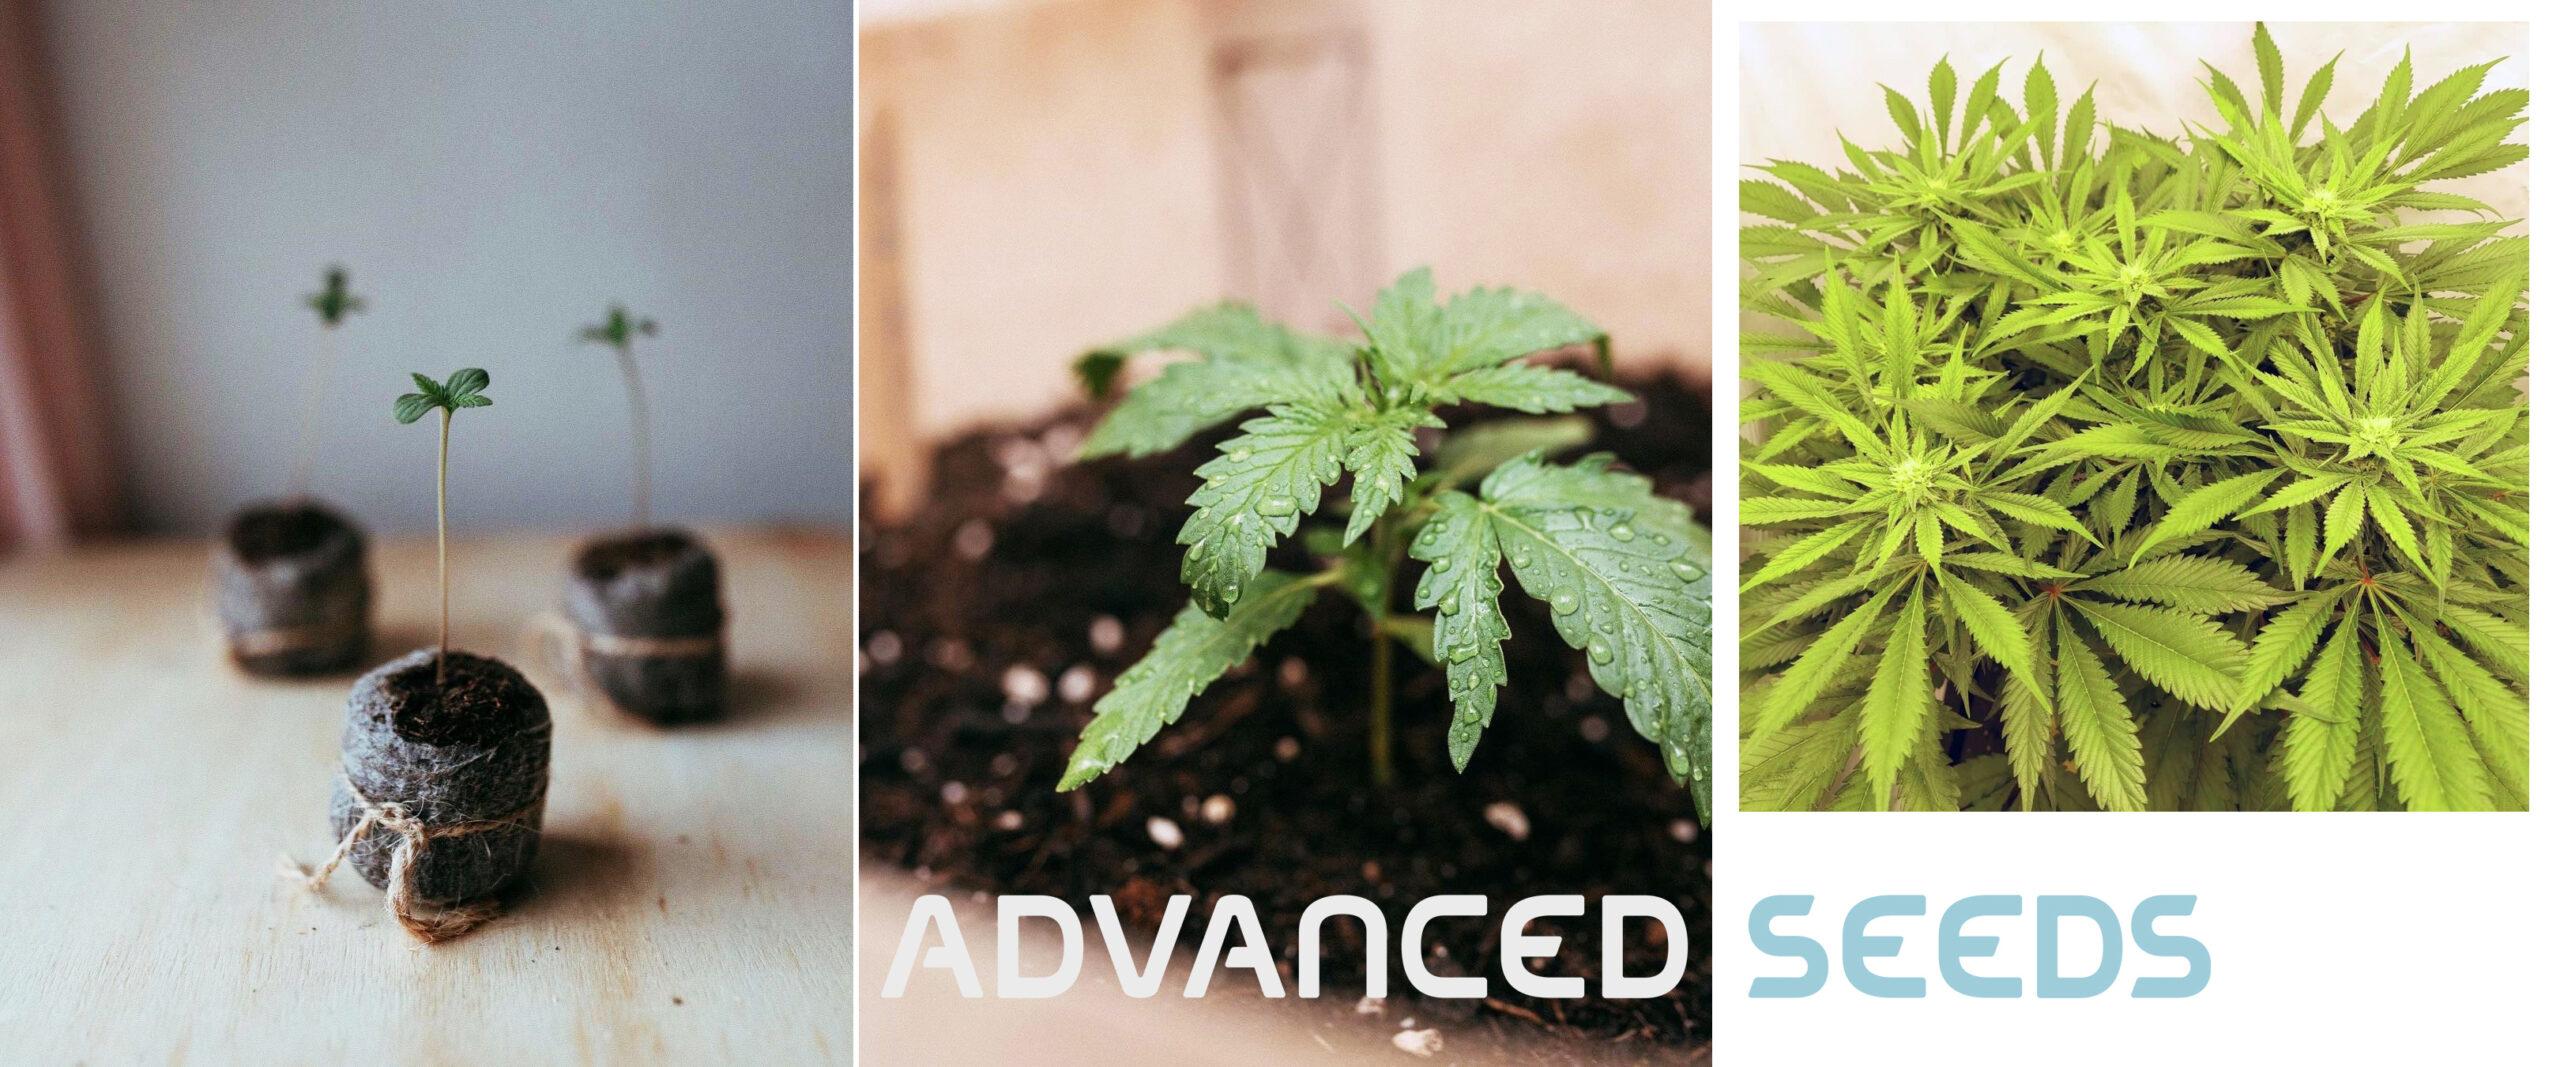 Advanced Seeds - semi cannabis